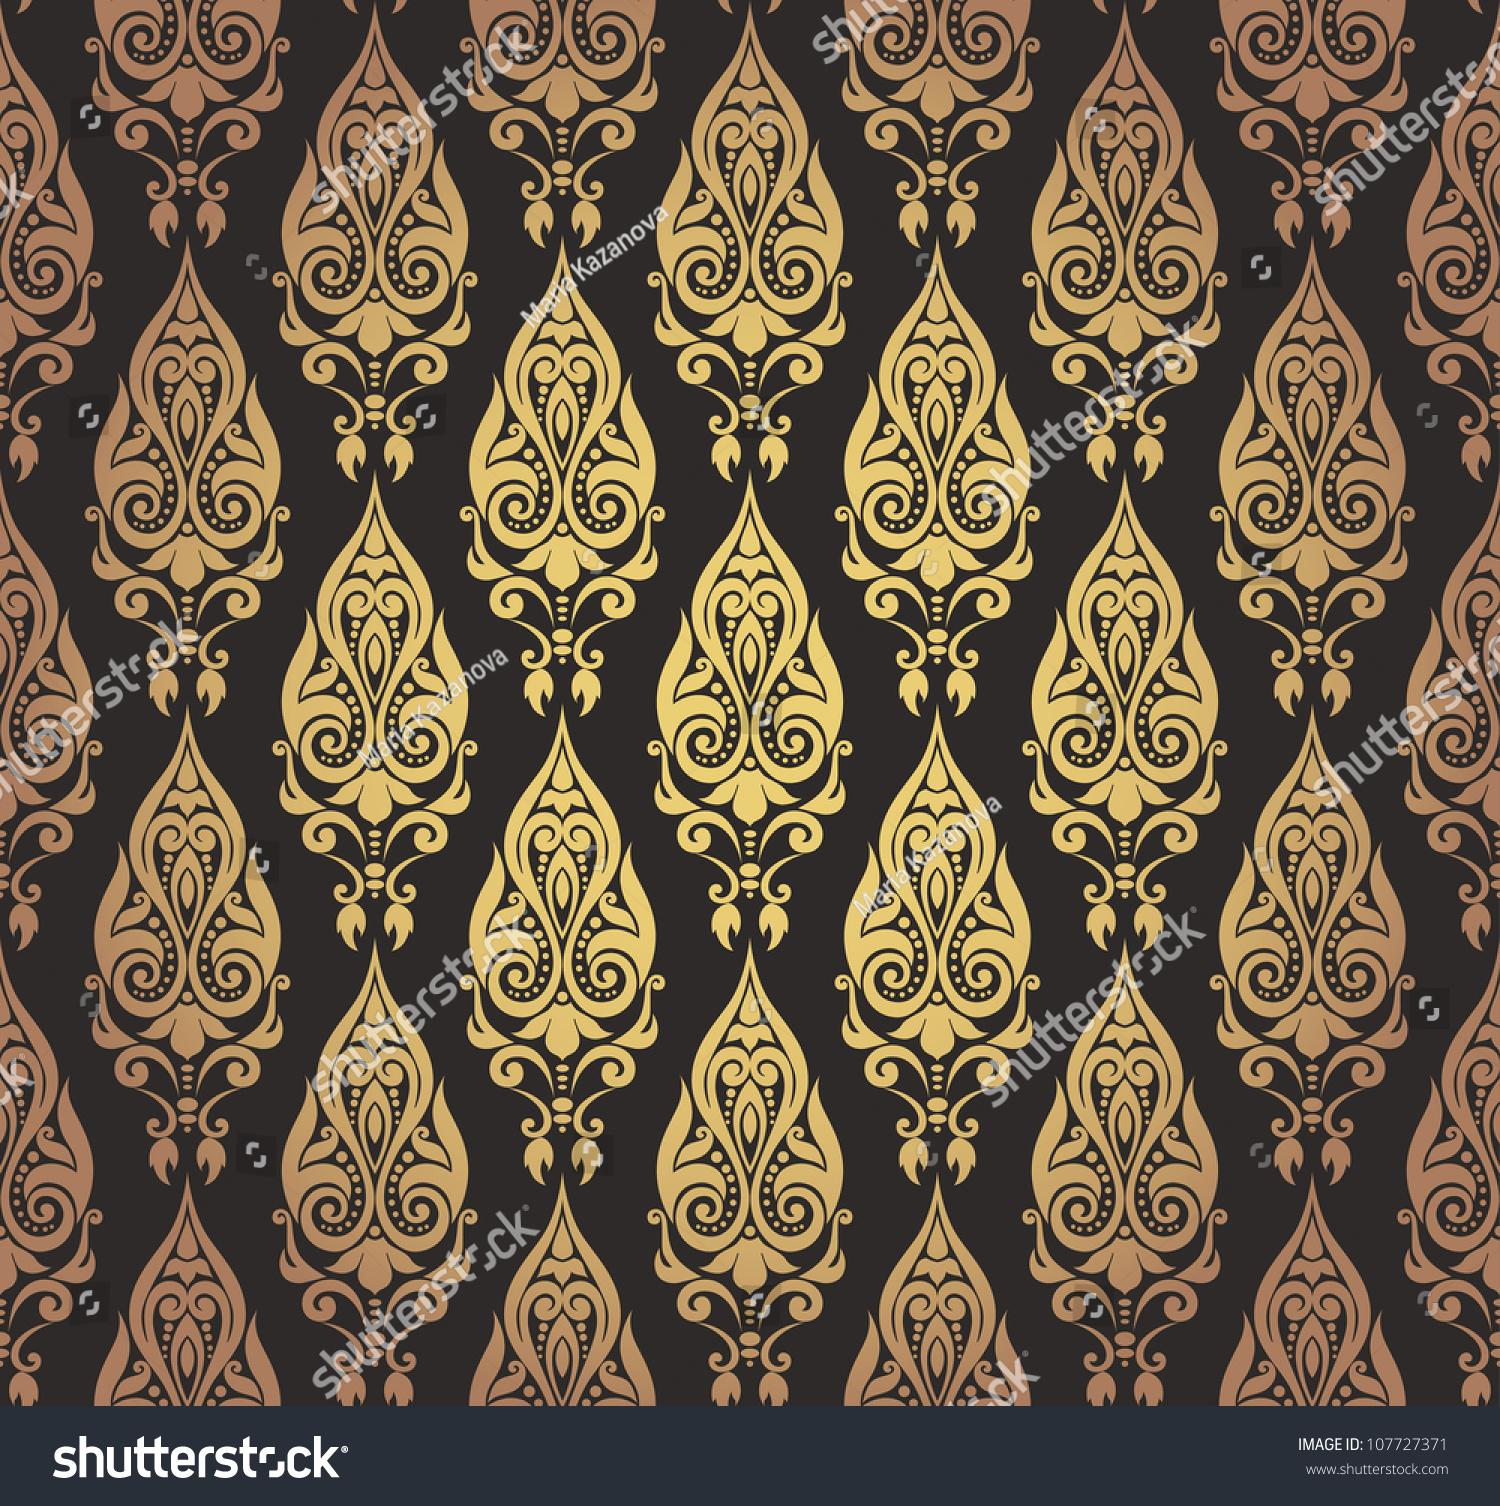 Vector Illustration Seamless Decorative Wallpaper Oriental Stock